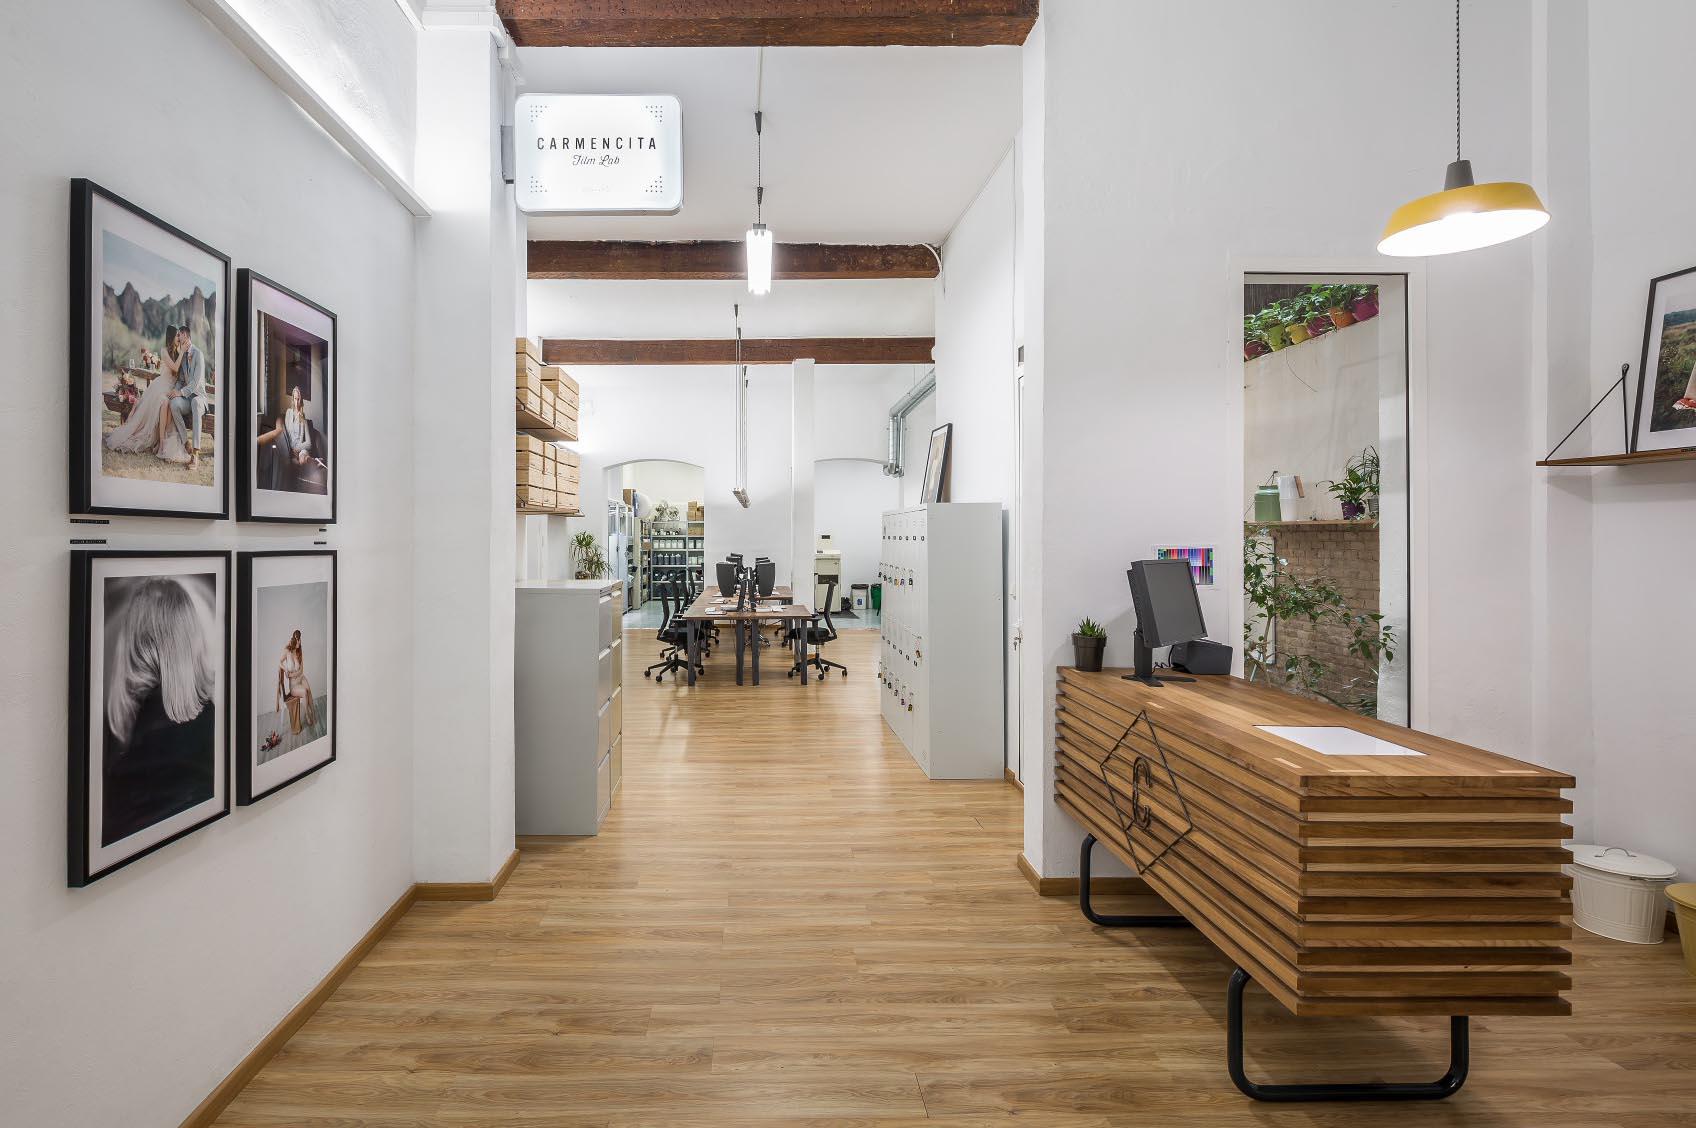 fotografia-arquitectura-interiorismo-valencia-german-cabo-boubau-carmencita-carmencitafilmlab (X)_portada